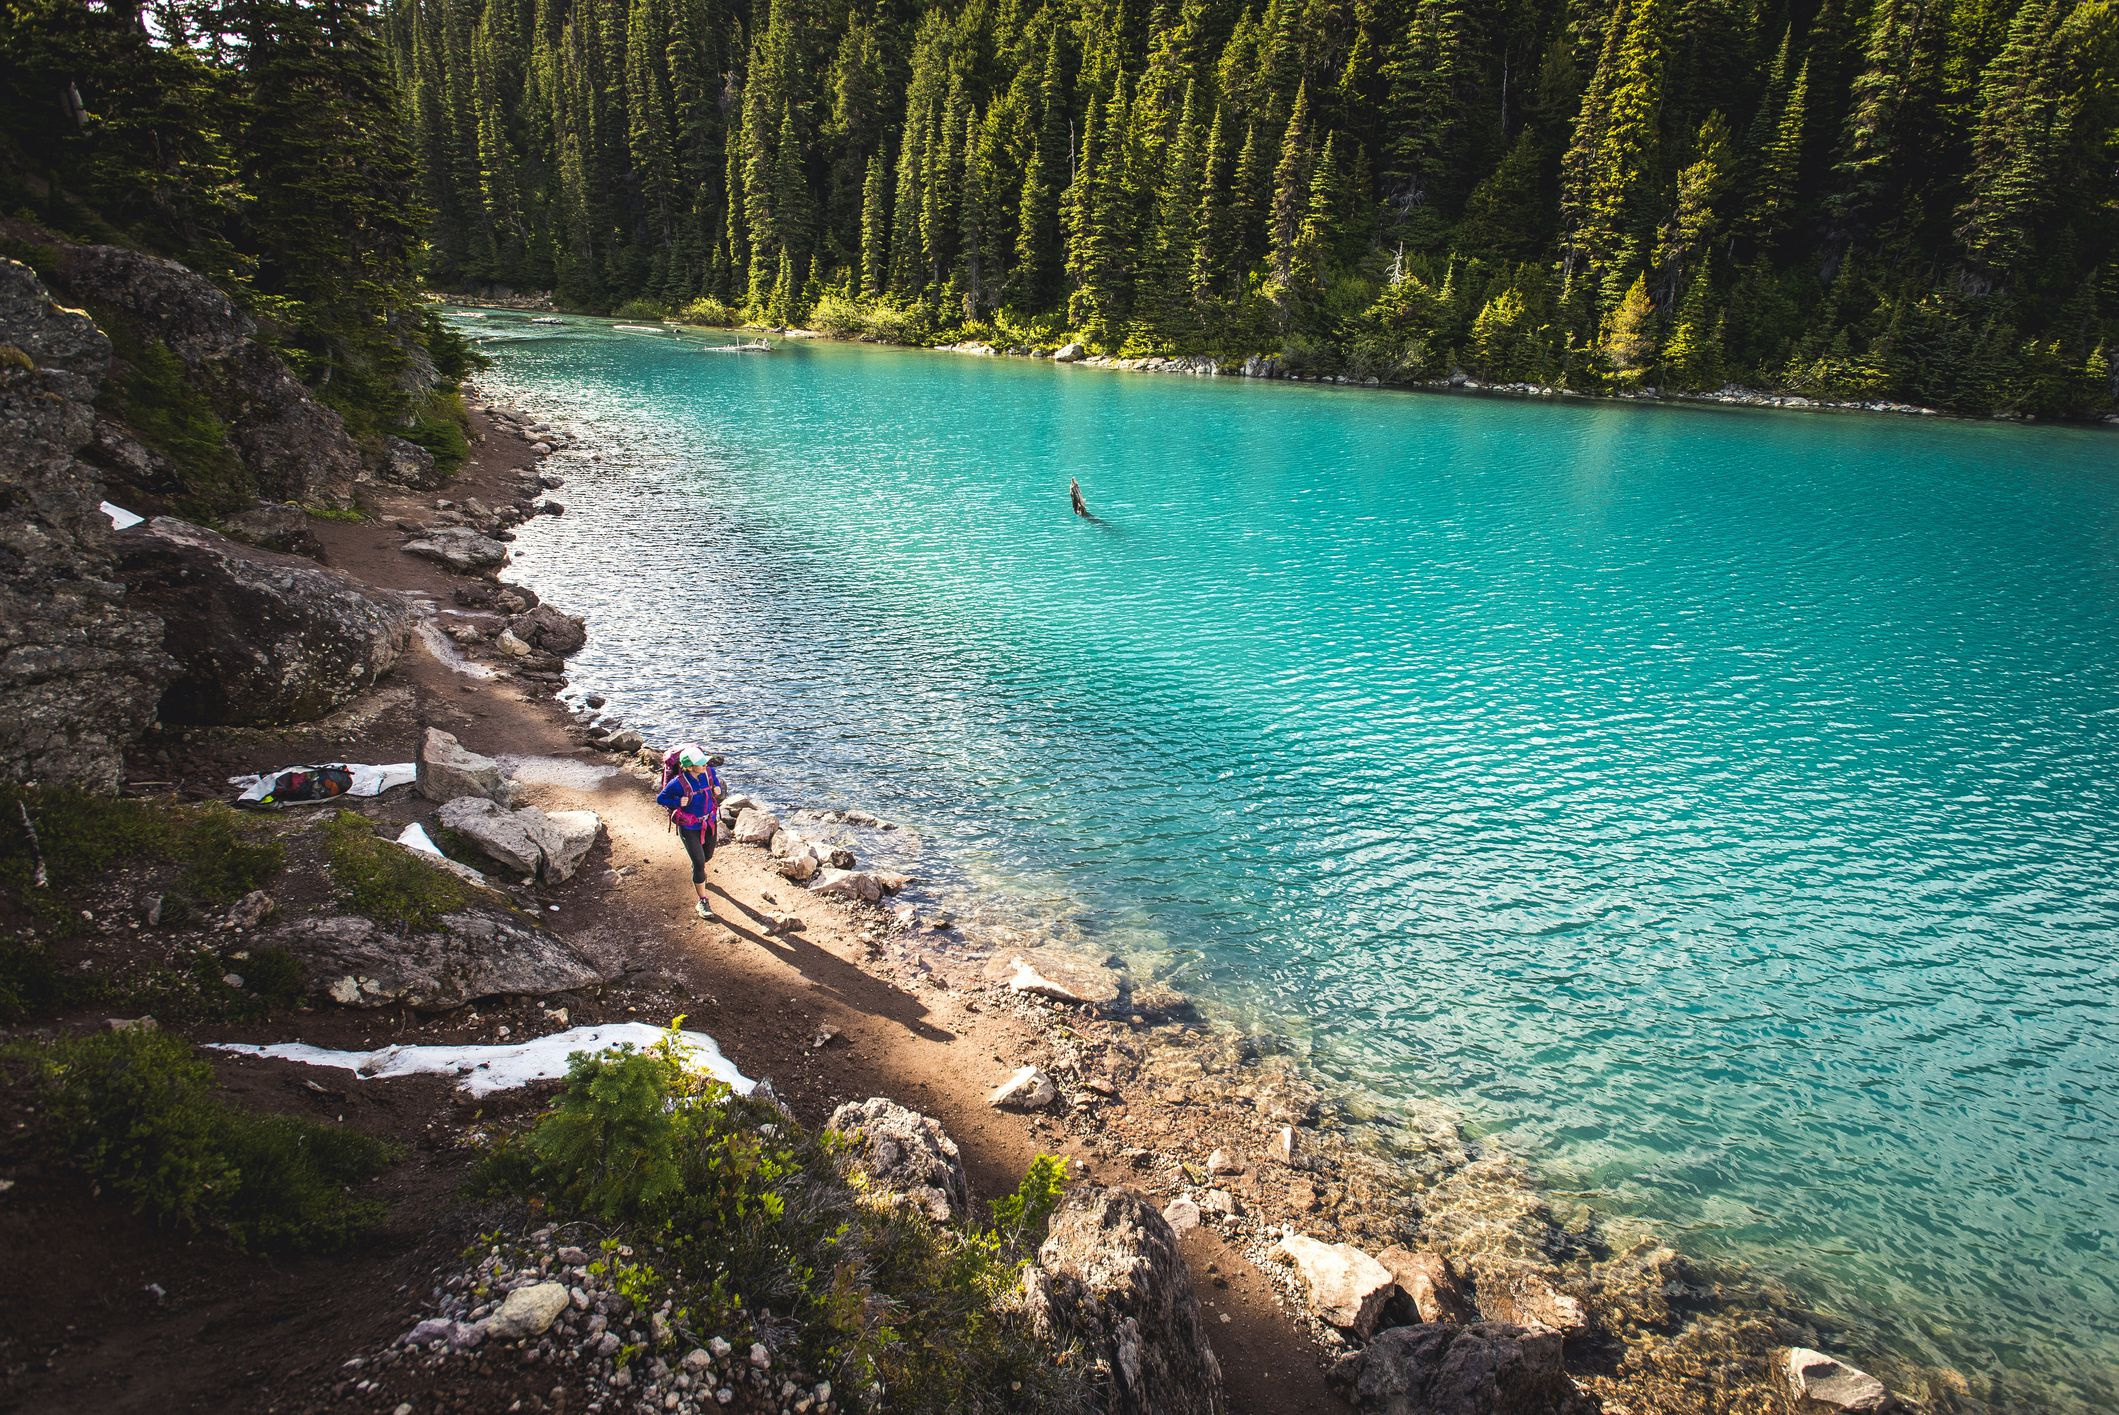 The shore of Garibaldi Lake in Garibaldi Provincial Park, British Columbia, Canada